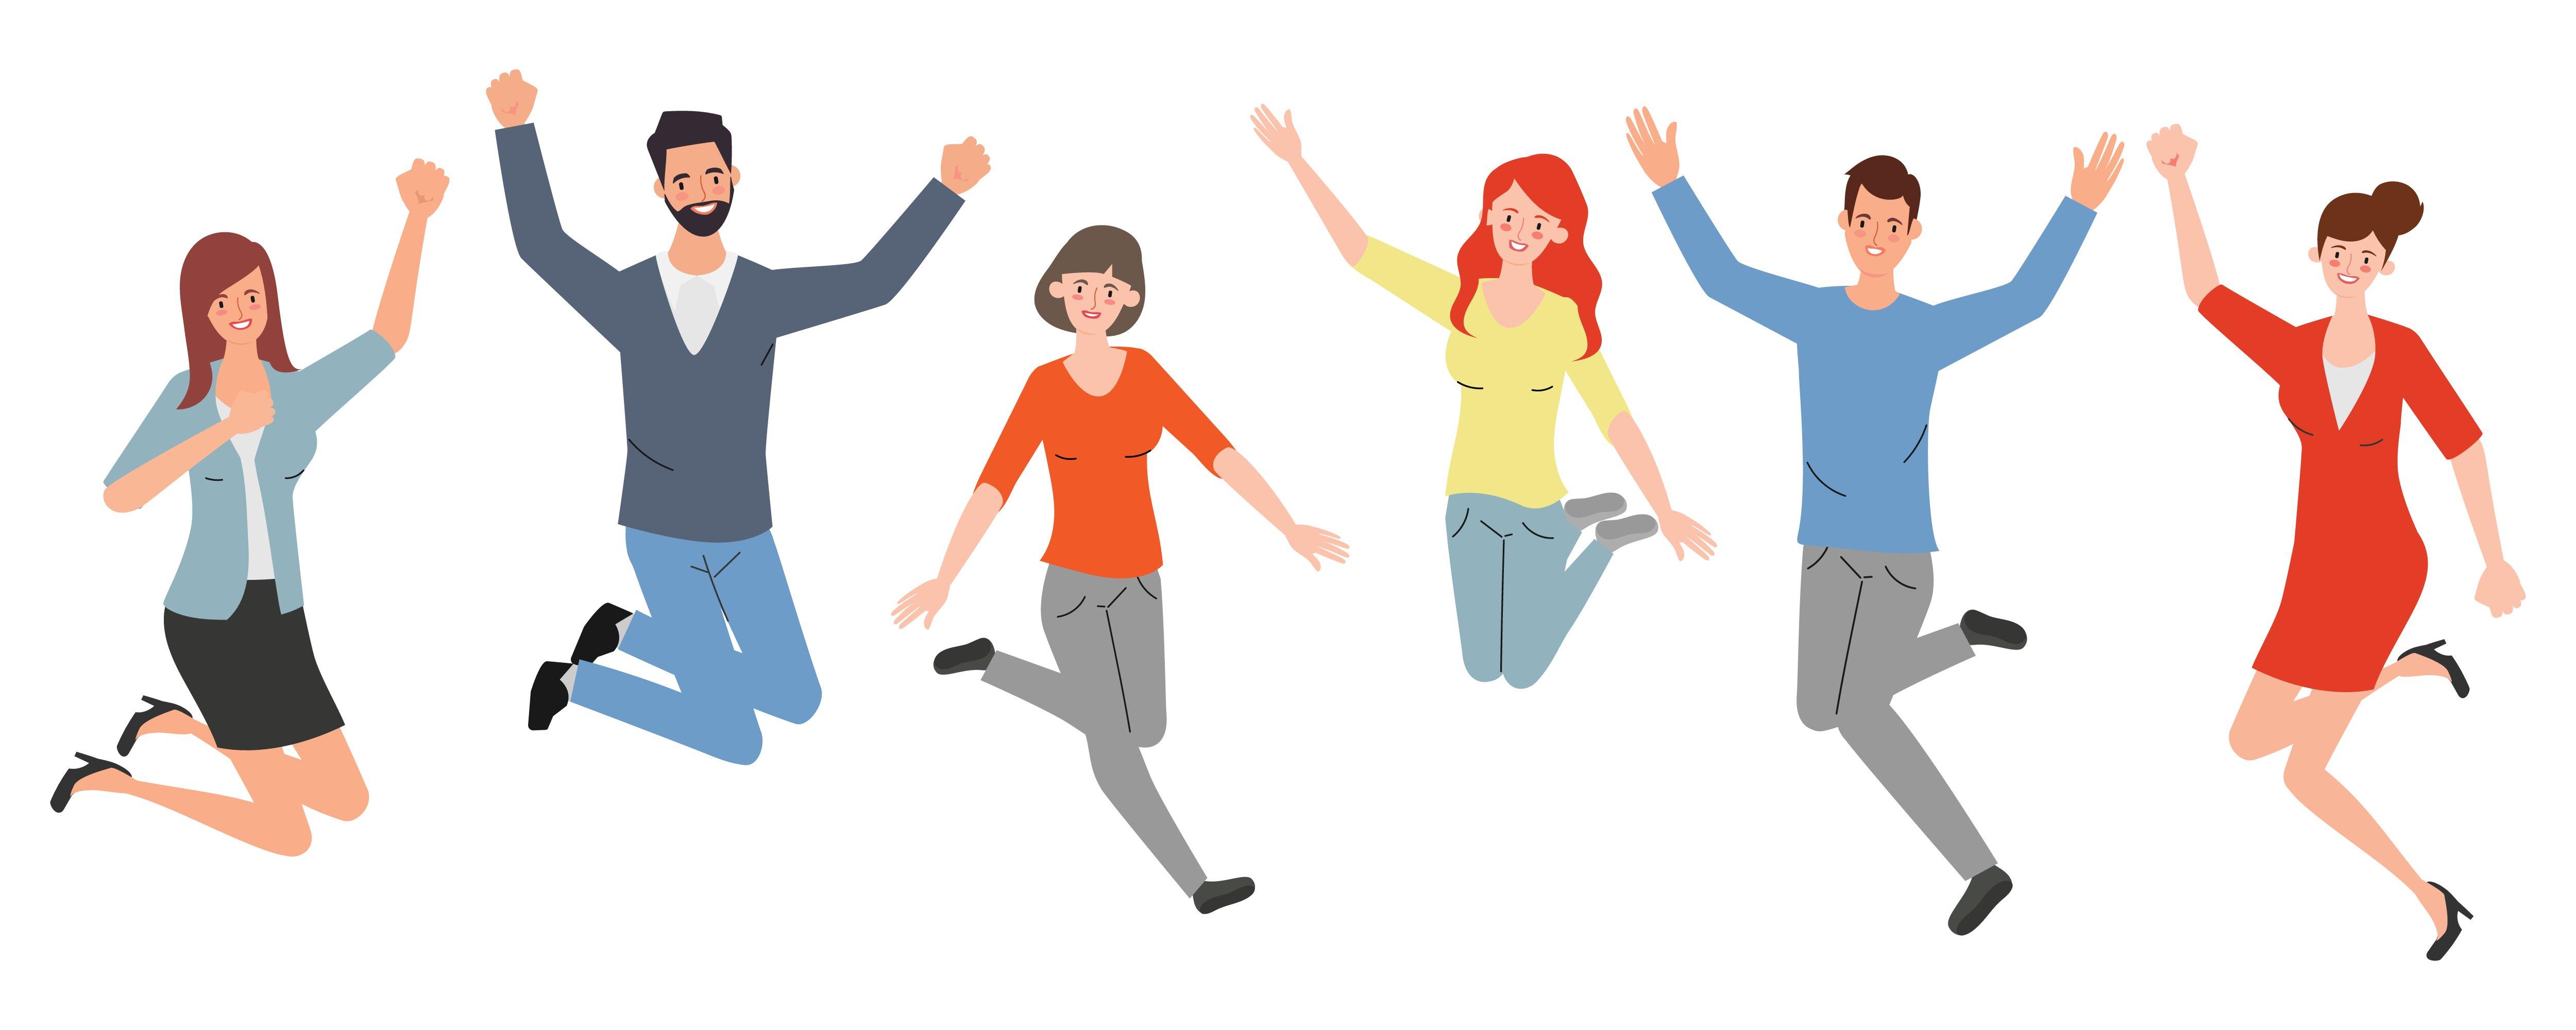 Happy emplpyees illustration